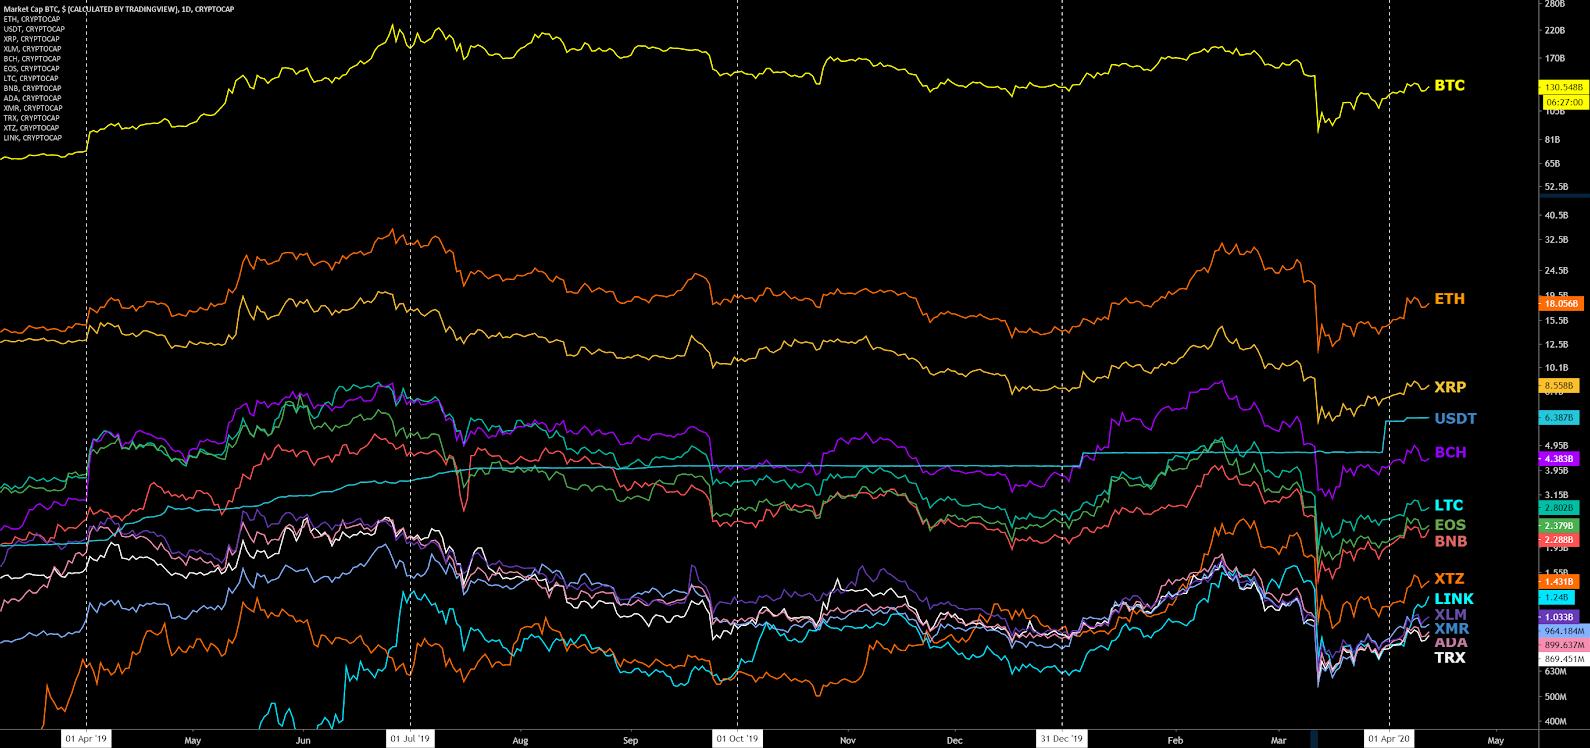 Bitcoin Price Analysis 13 Apr 2020 (1)